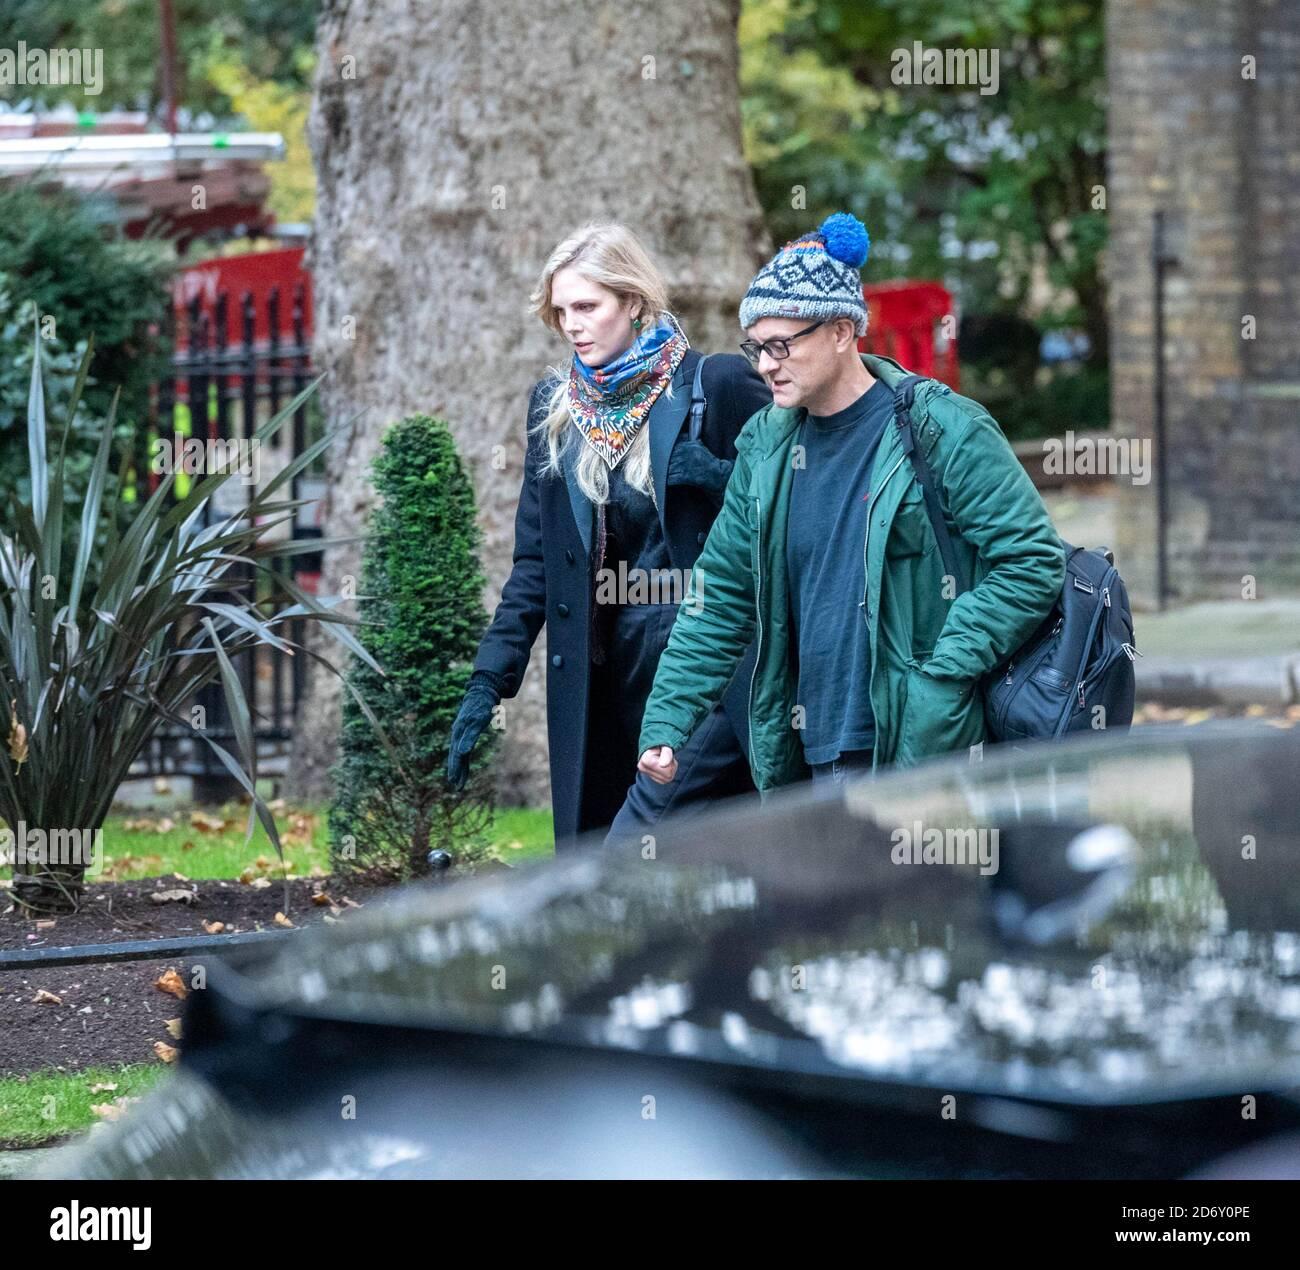 London, UK. 20th Oct, 2020. Dominic Cummings arrives at Downing Street London. Credit: Ian Davidson/Alamy Live News Stock Photo